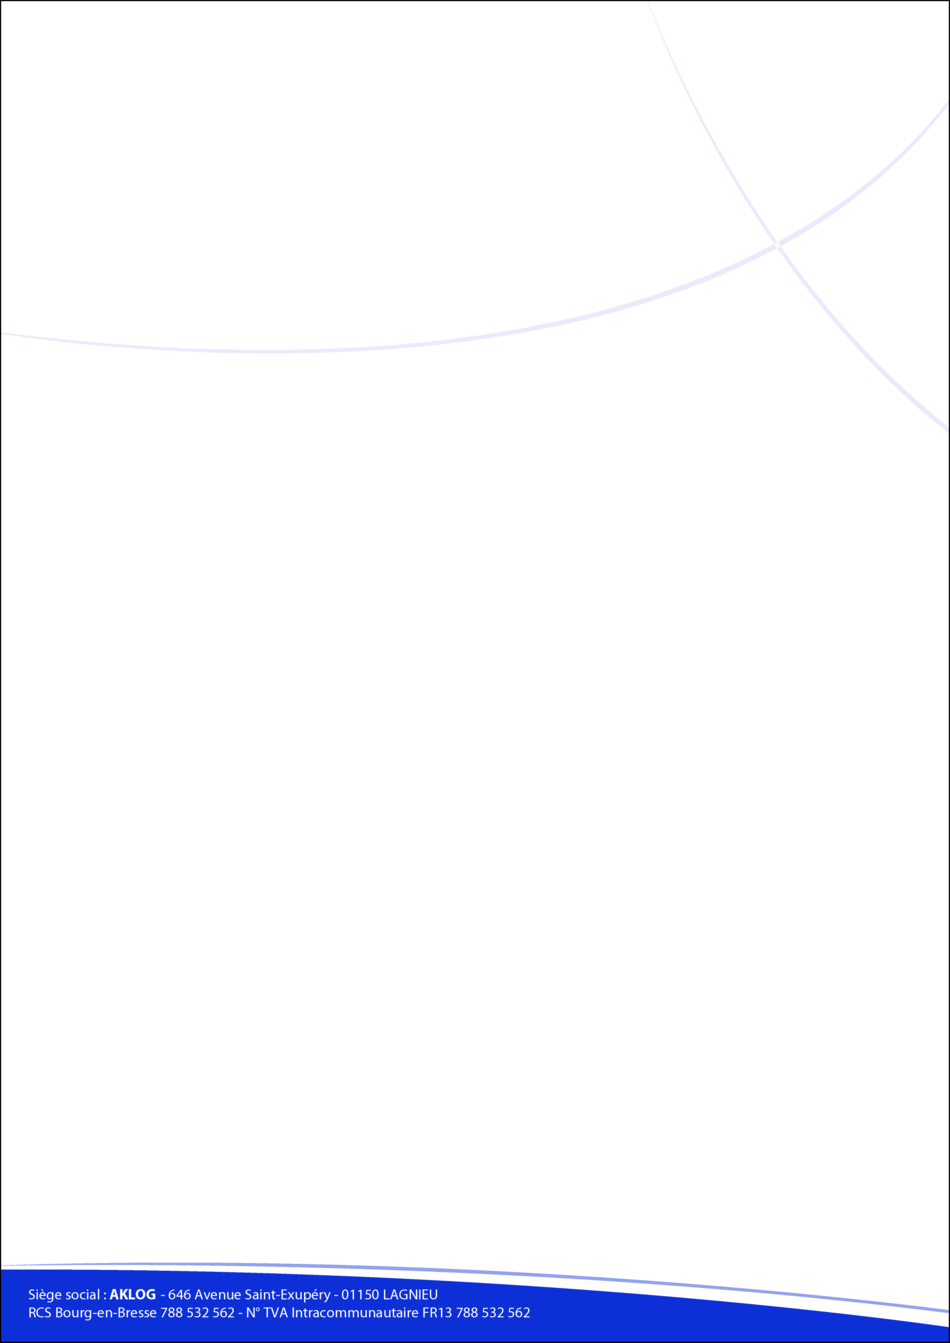 Super Exemple de logo créer avec logogenie.fr YI96